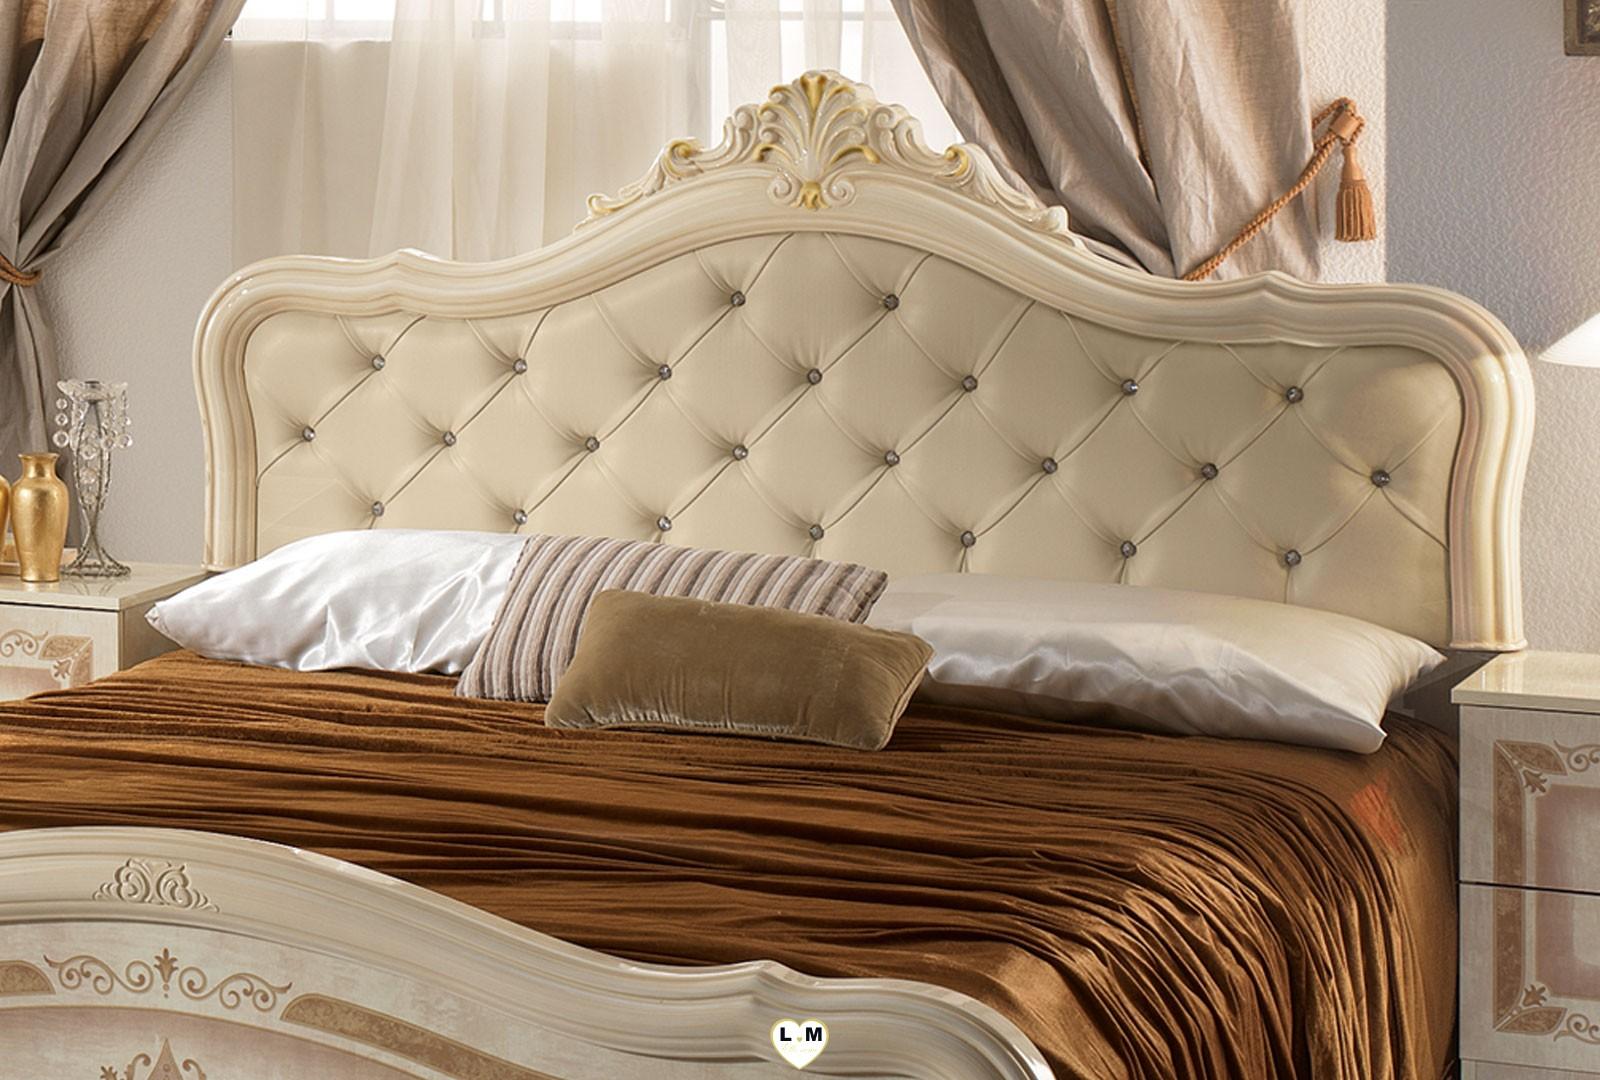 Thyda laque beige nuage ensemble chambre a coucher for Chambre a coucher ensemble